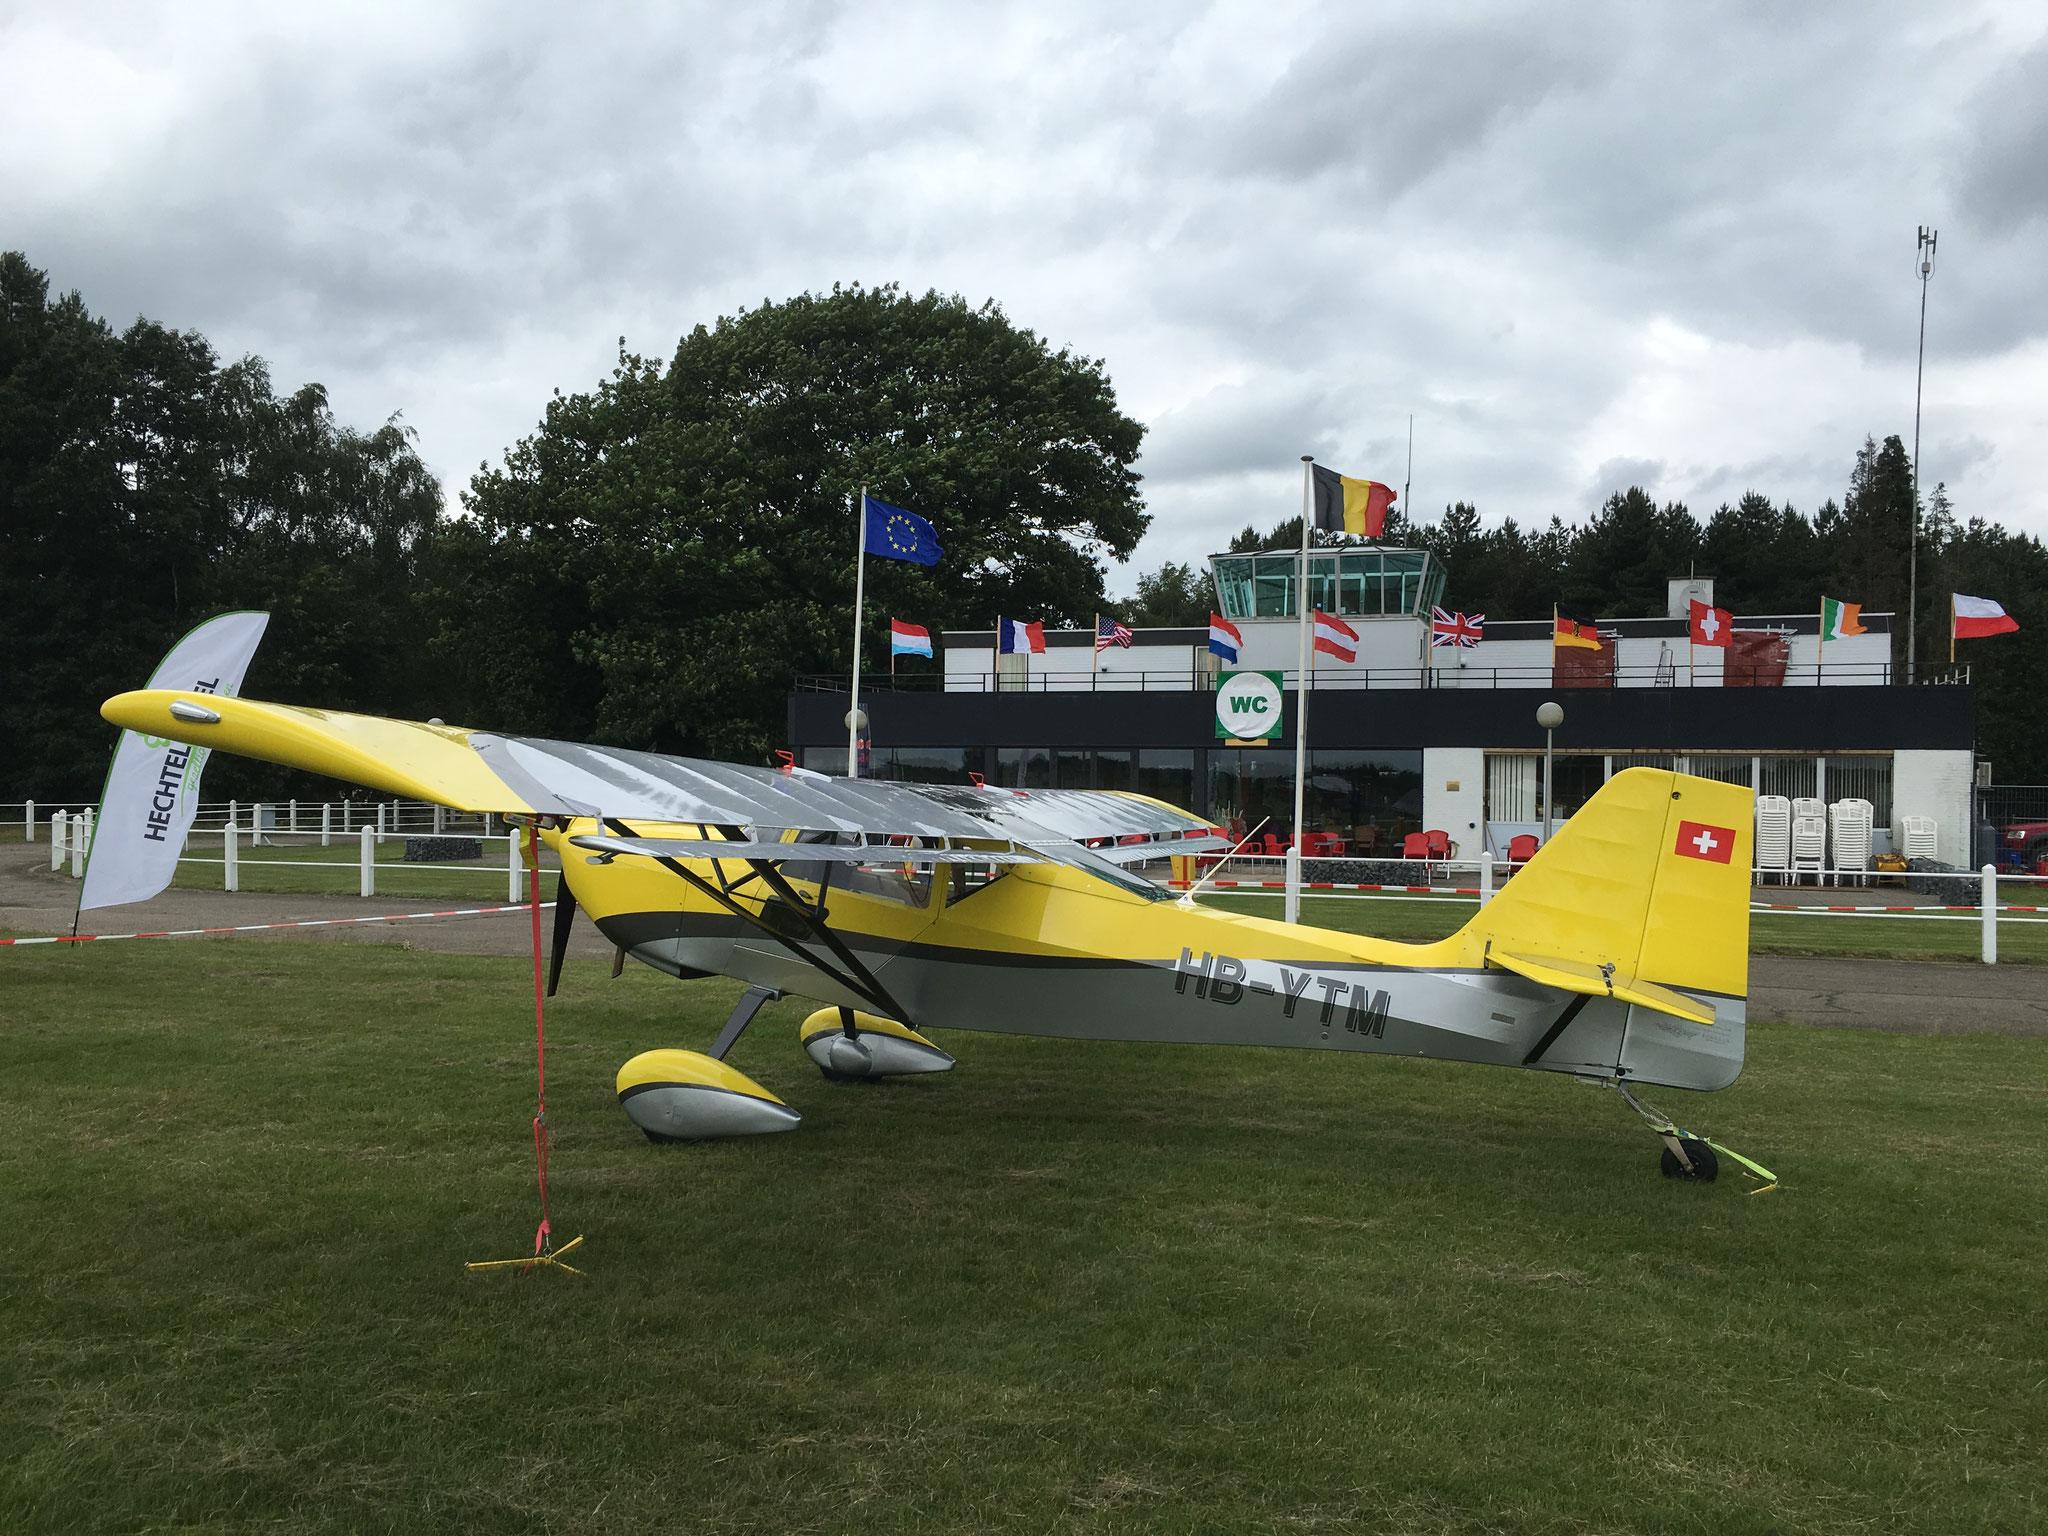 Yellow Fox erhält Pol Position an der Flightline